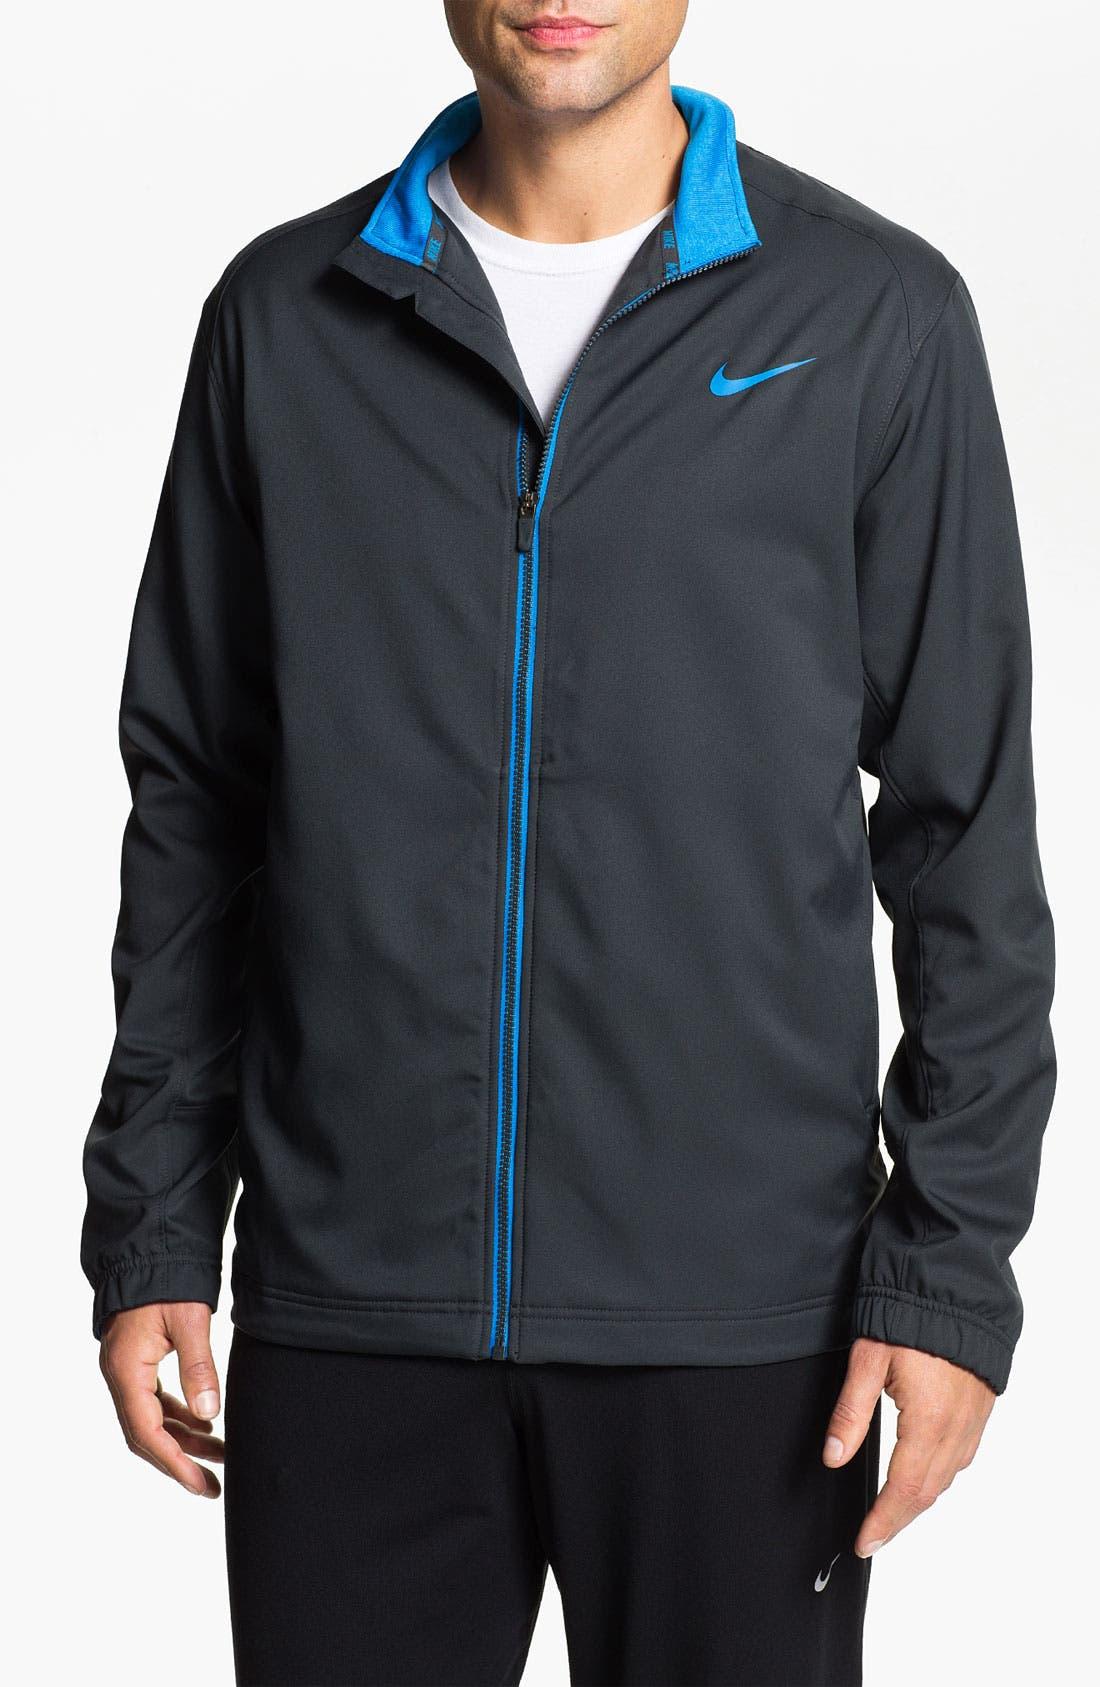 Alternate Image 1 Selected - Nike 'Speed' Jacket